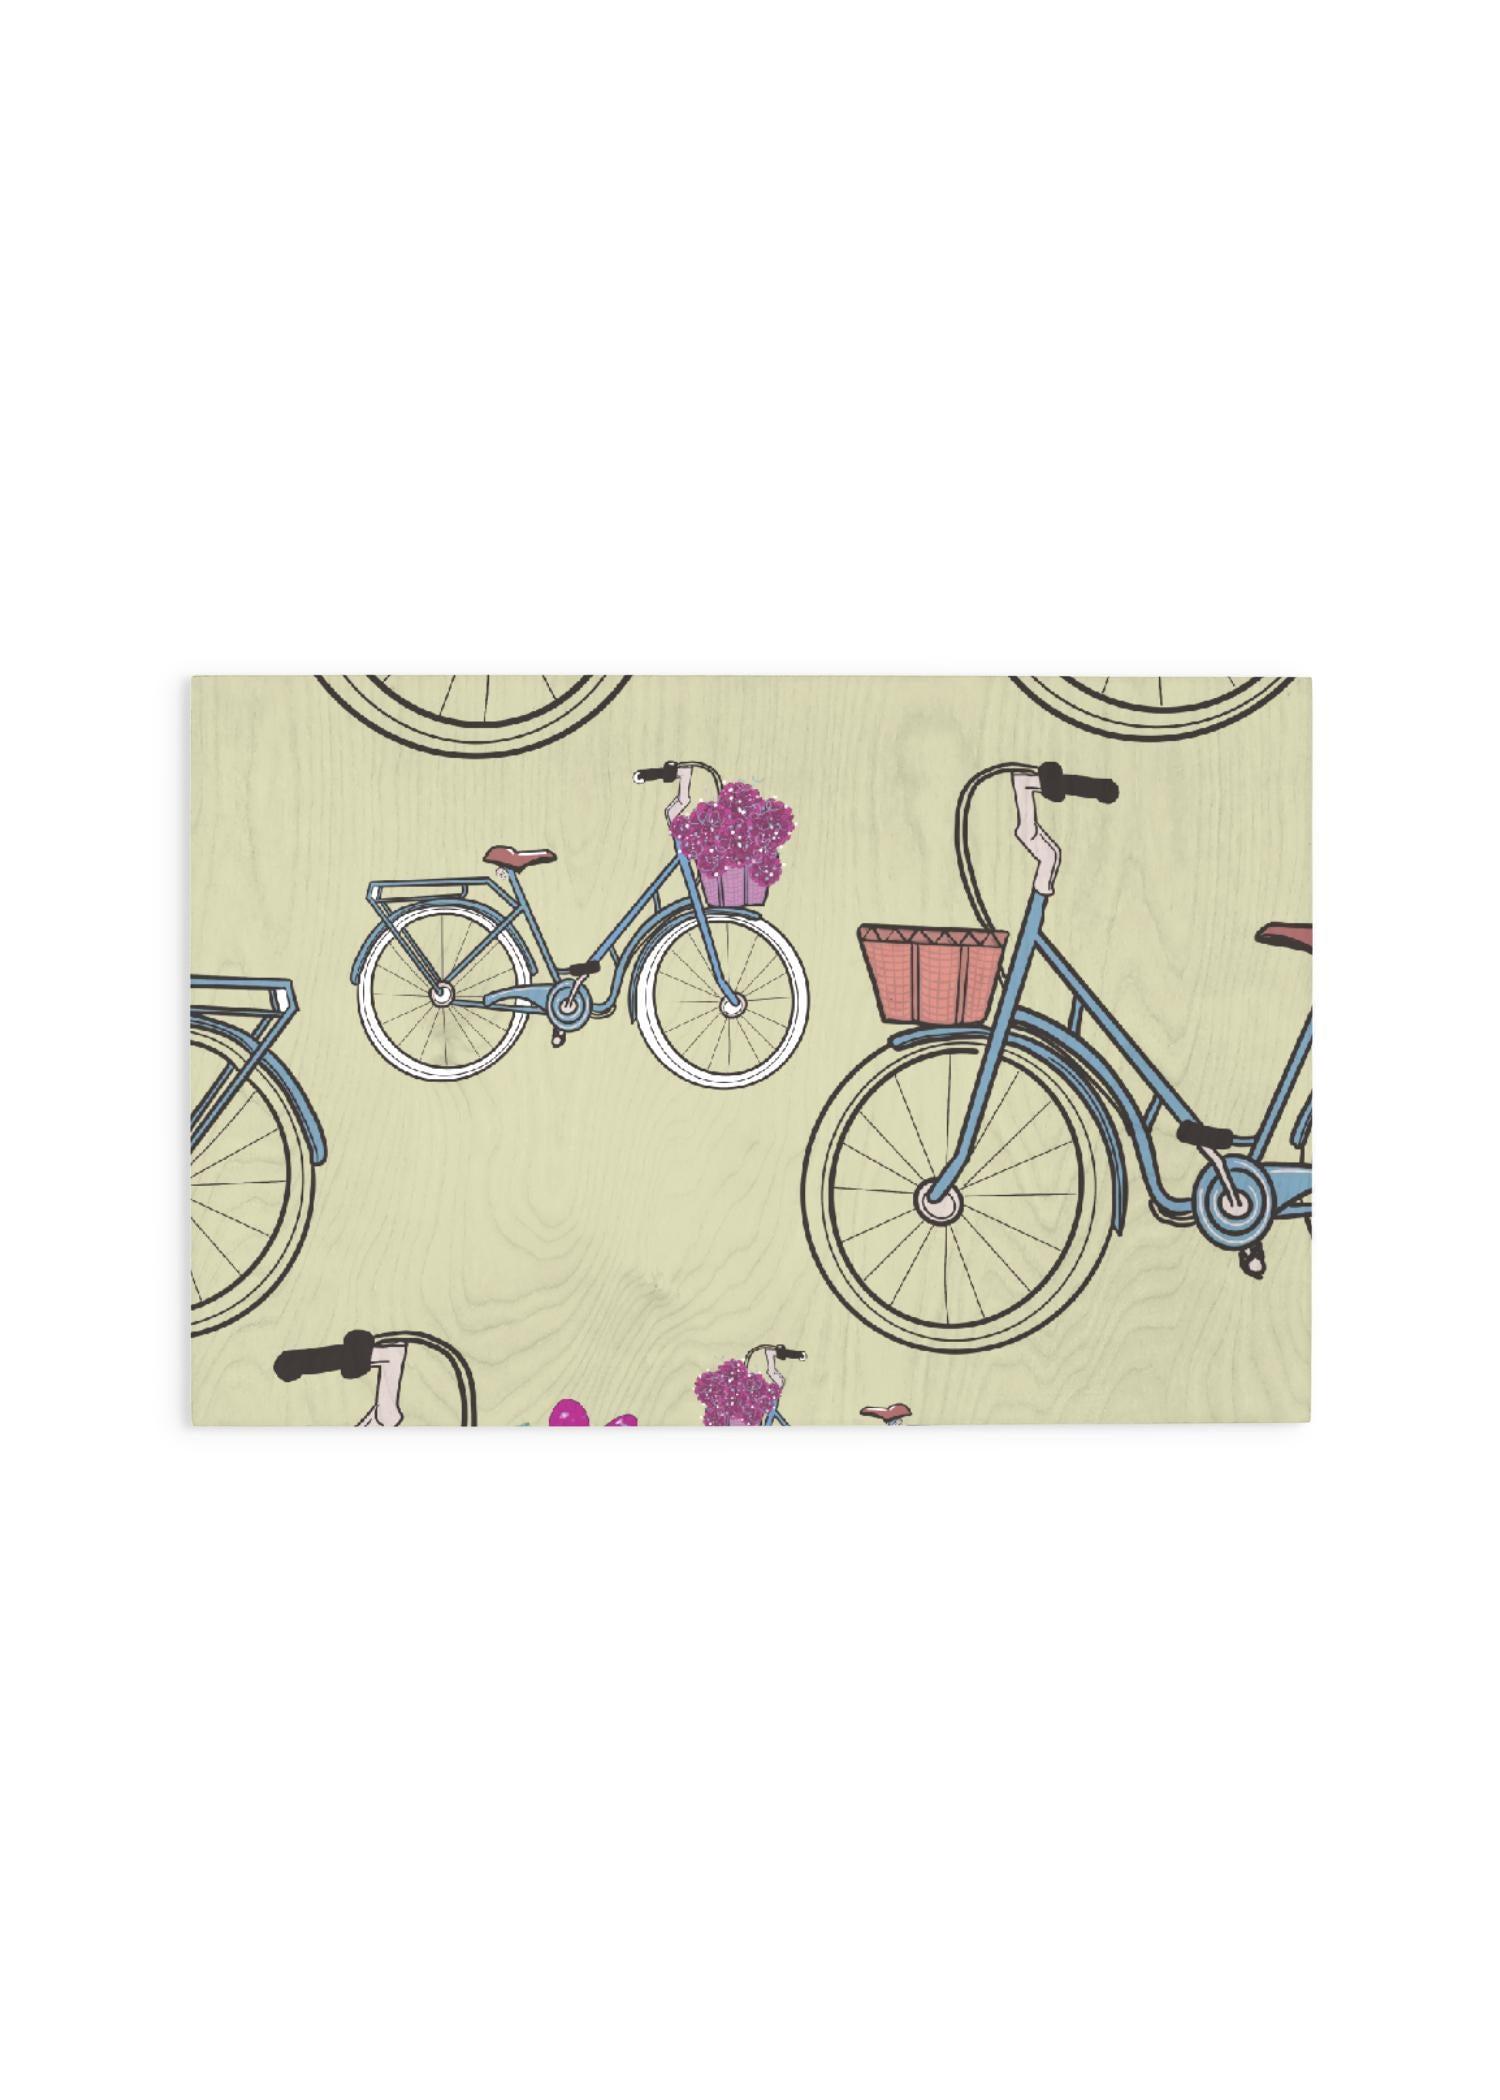 VIDA Wood Wall Art - 30x20 - Bike Day by VIDA Original Artist  - Size: Large